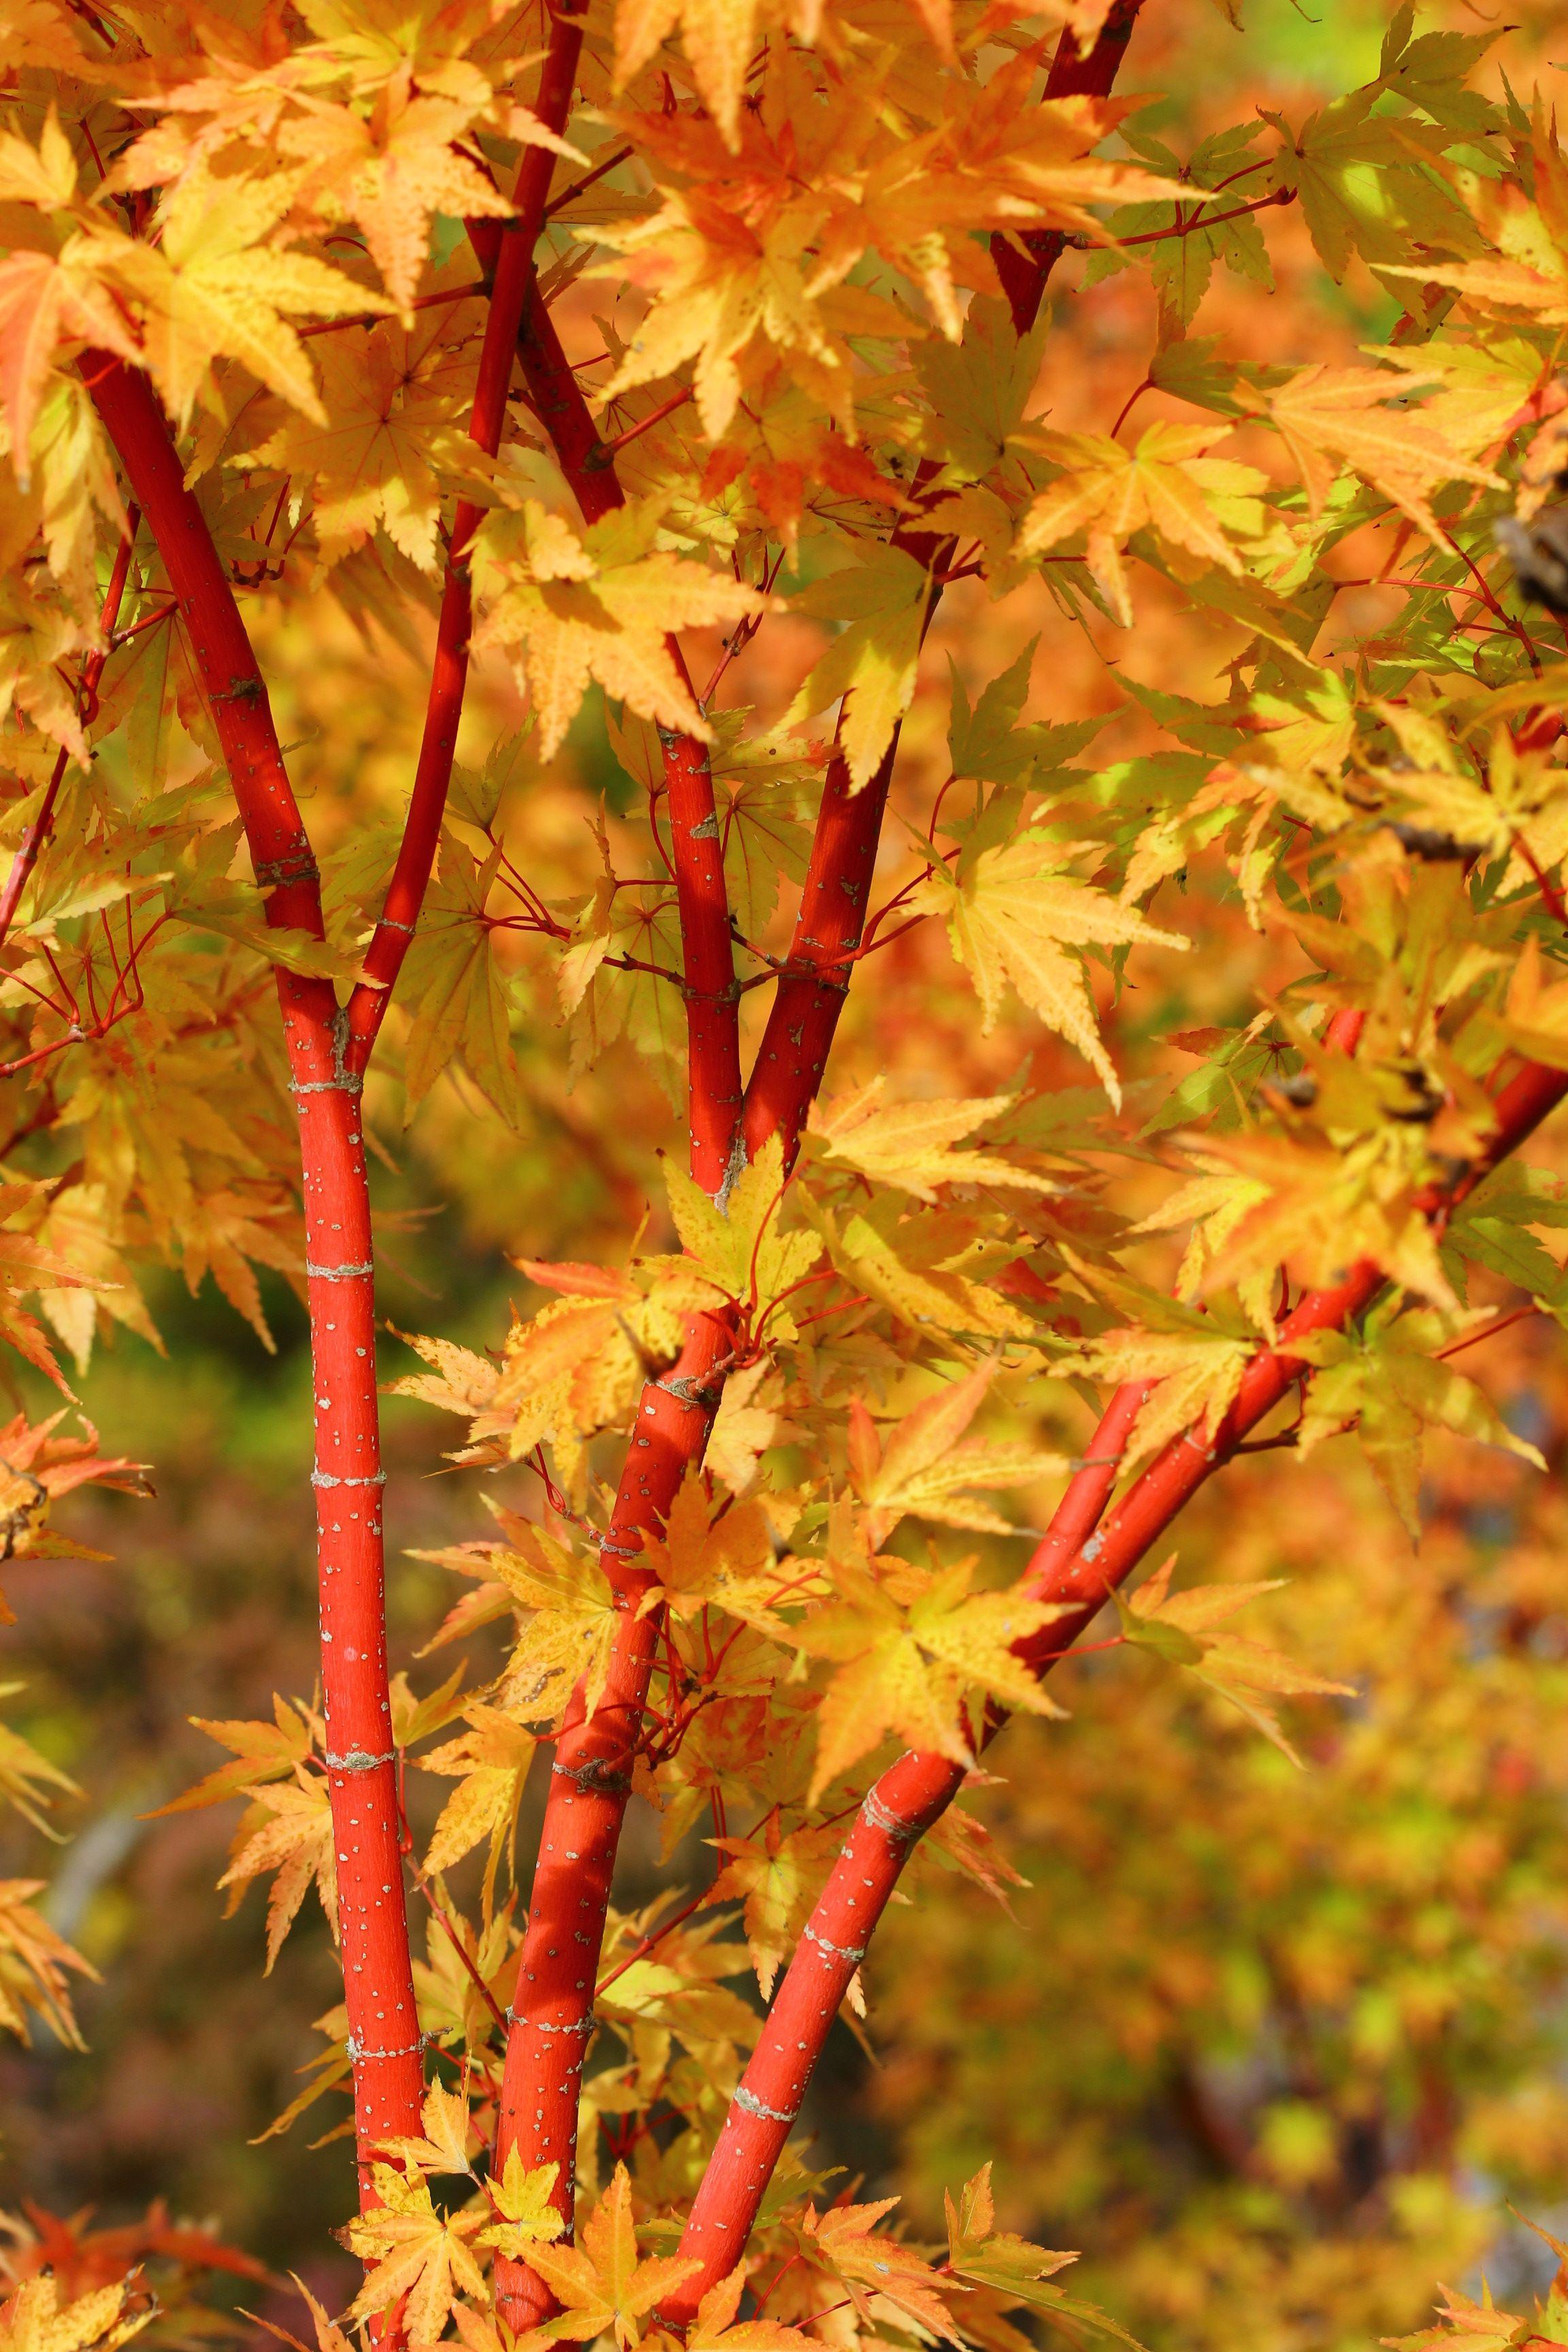 Pin By Conifer Kingdom On Autumn Beauty Acer Palmatum Garden